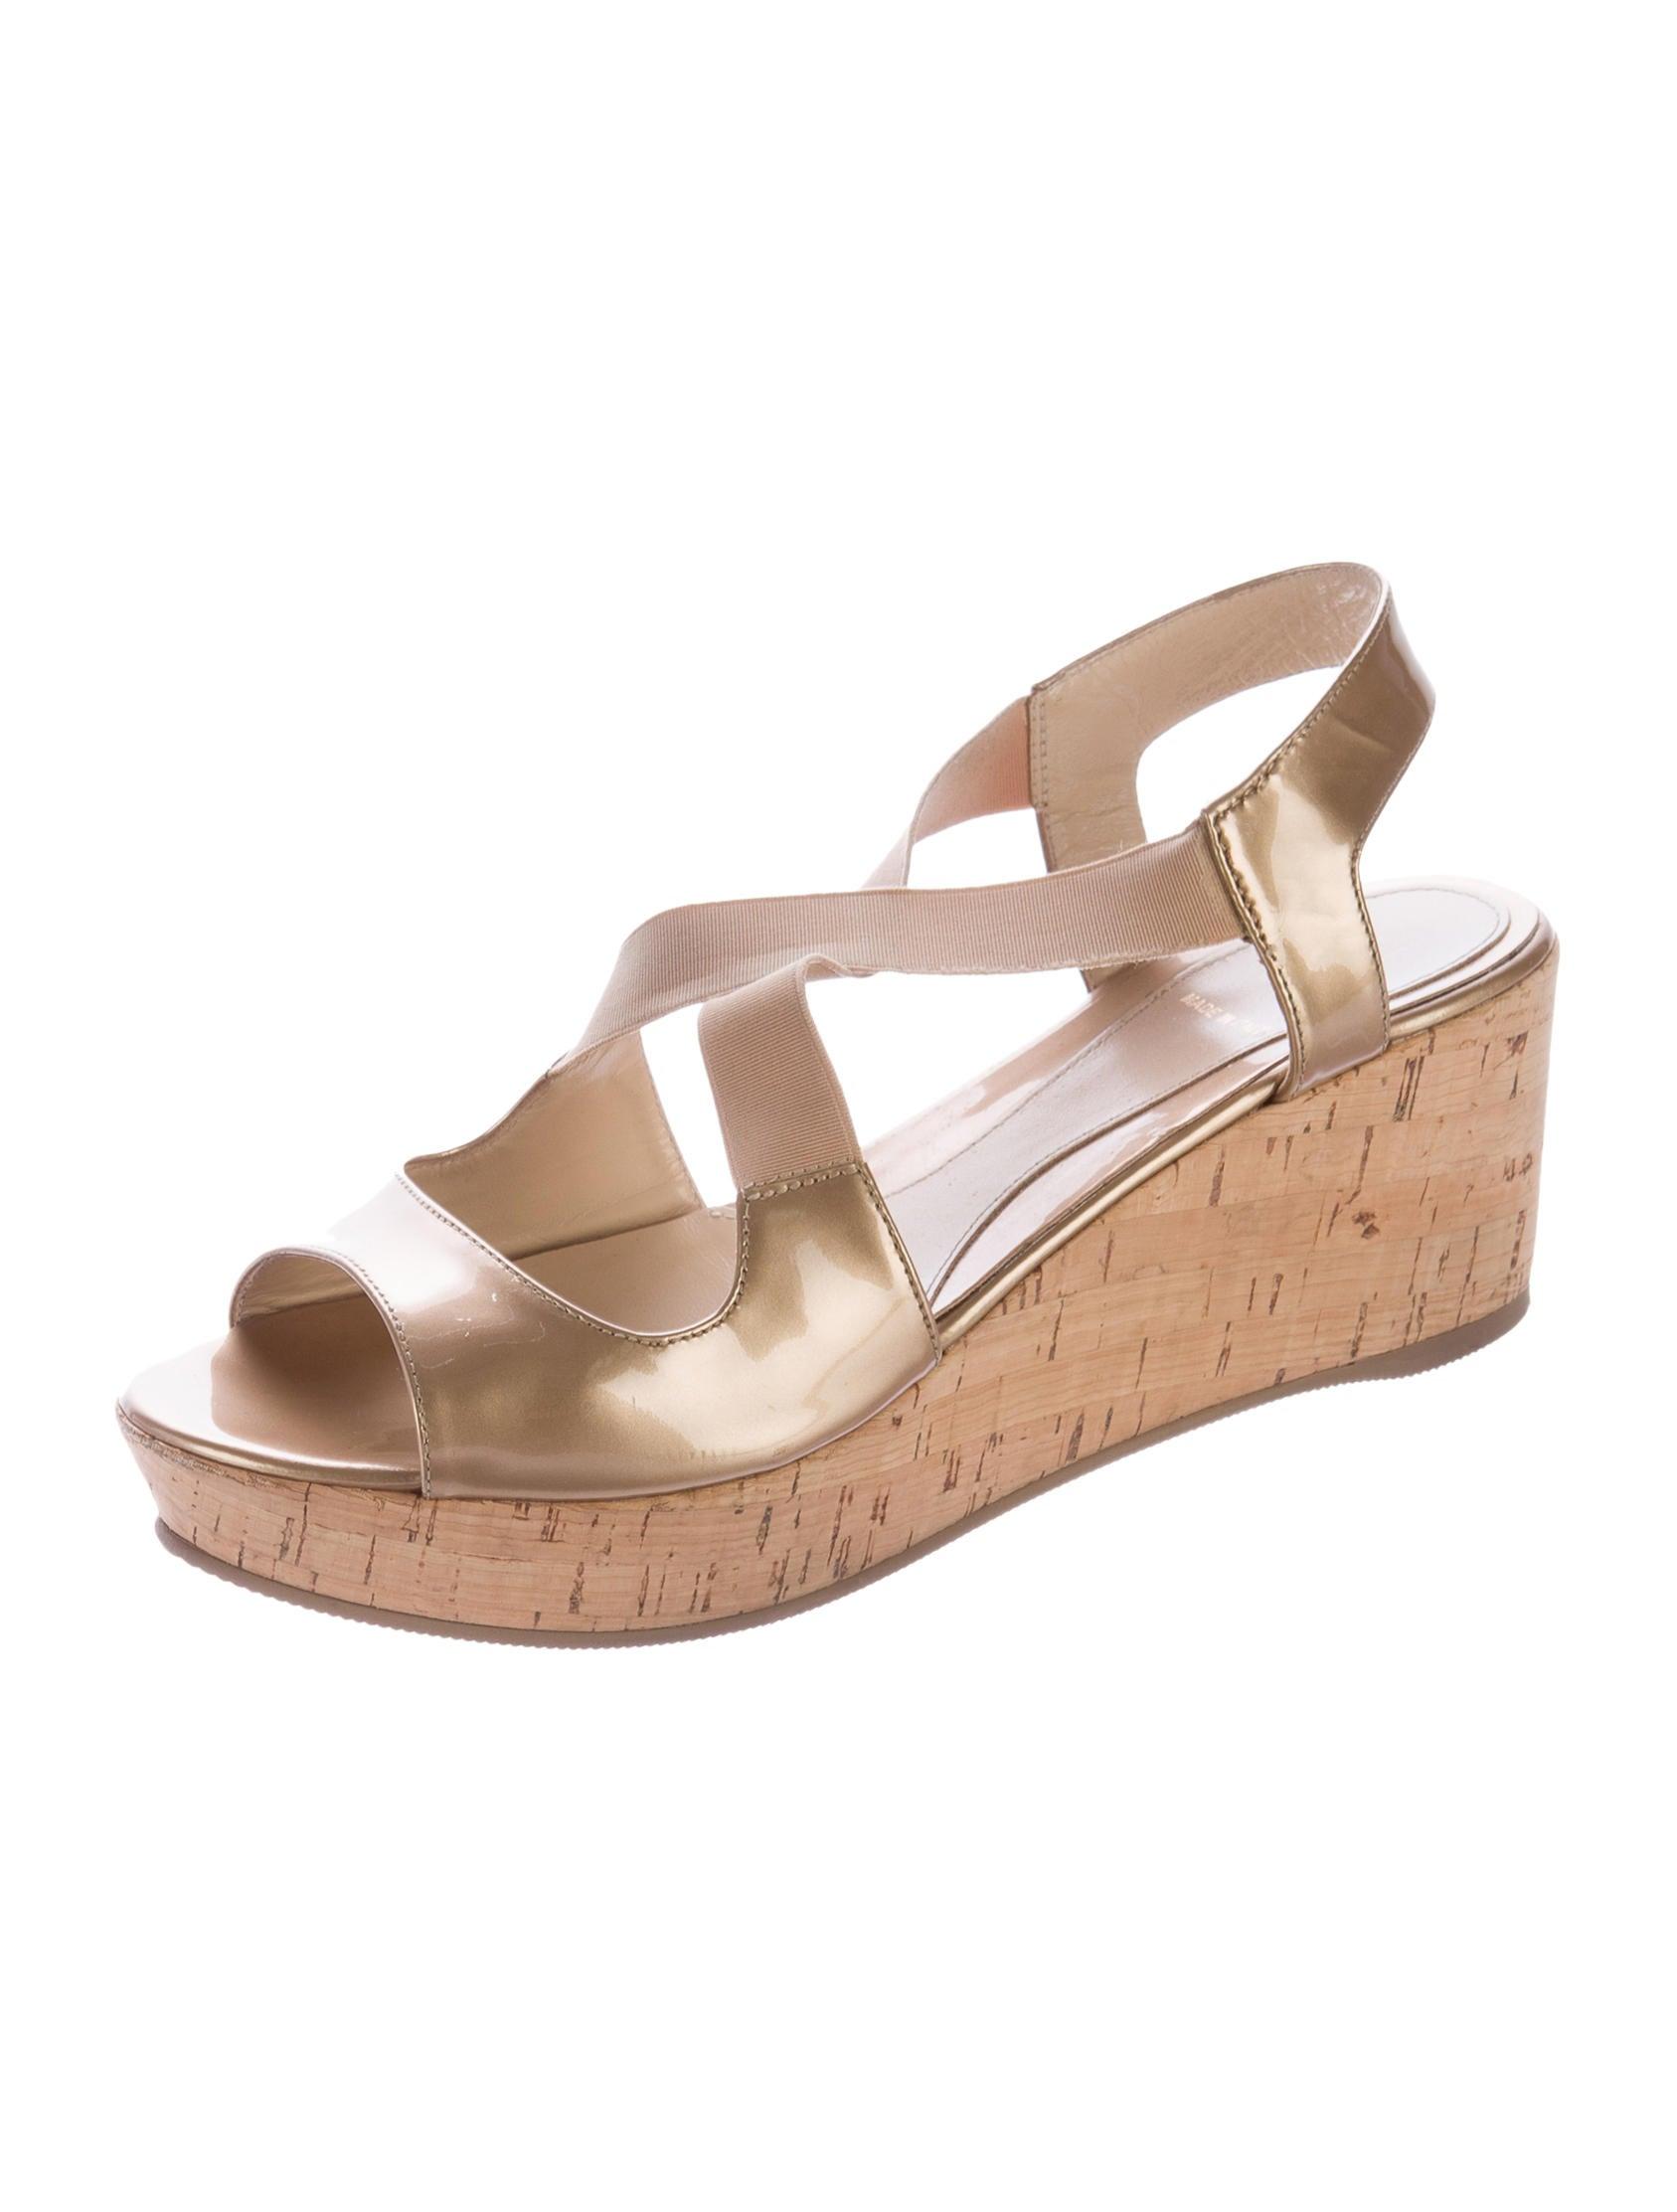 fendi metallic wedge sandals shoes fen46314 the realreal